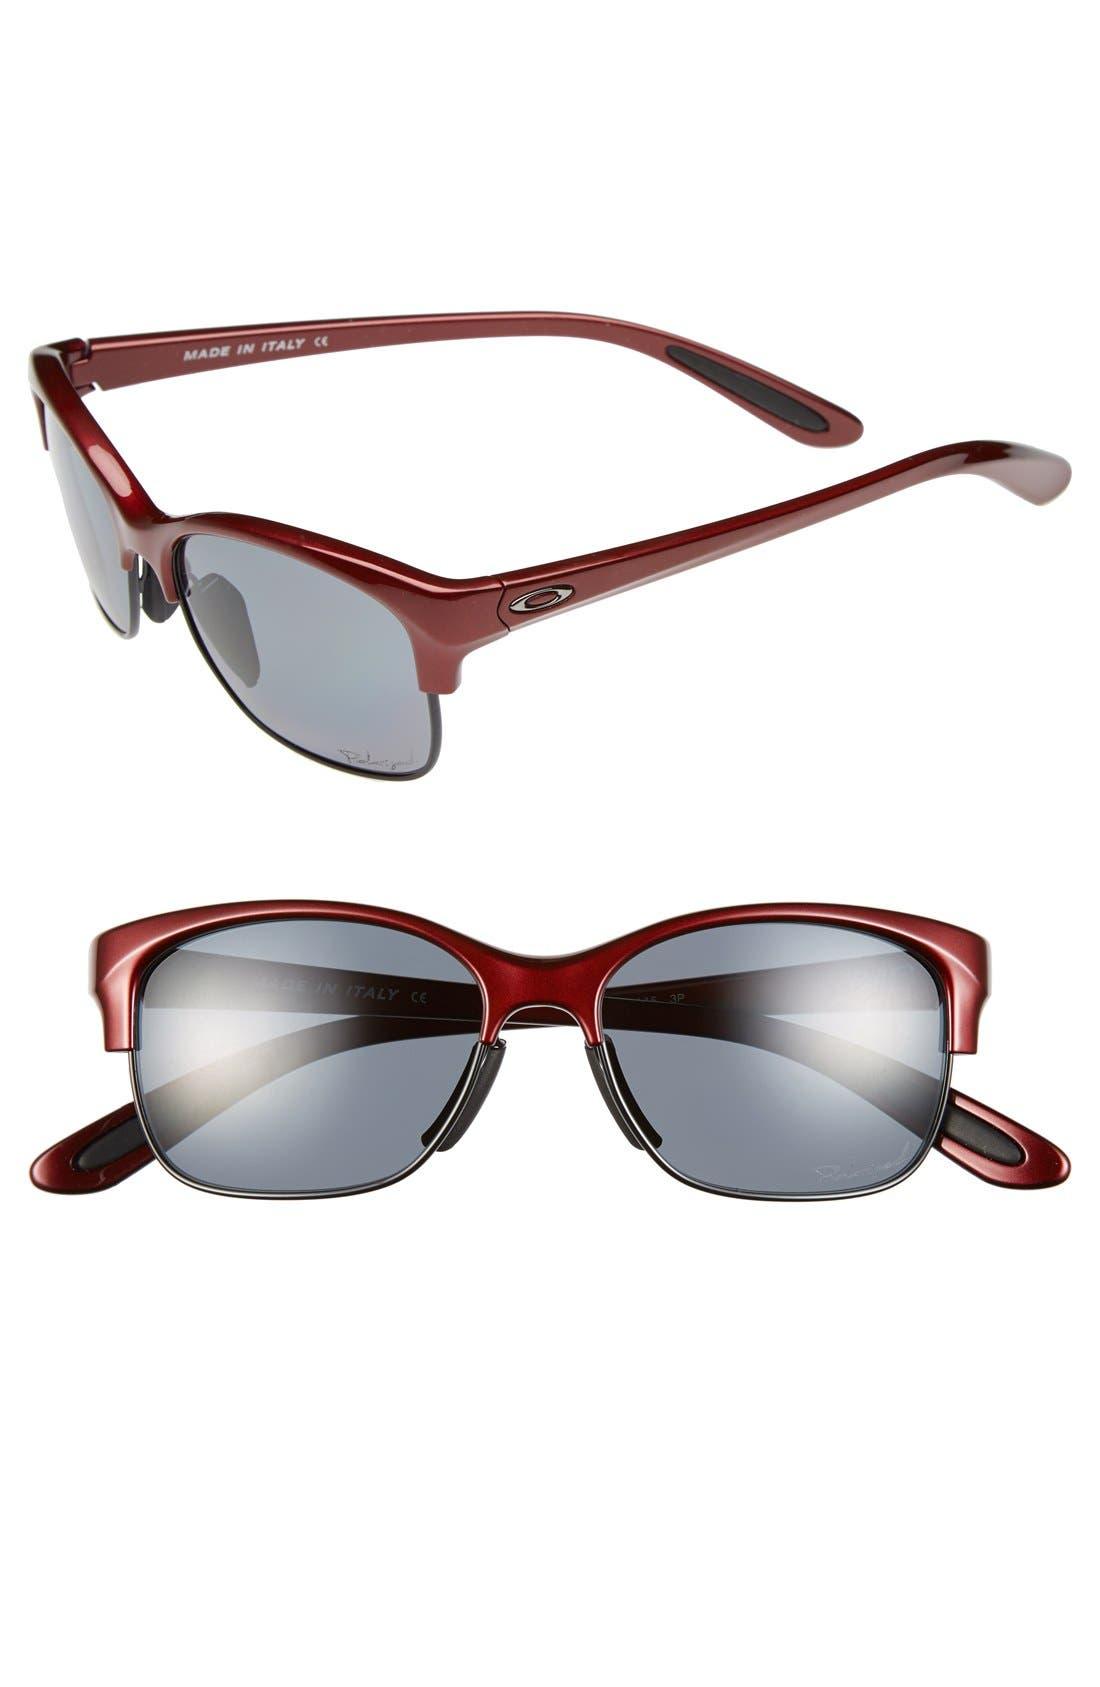 Alternate Image 1 Selected - Oakley 'RSVP' 53mm Sunglasses